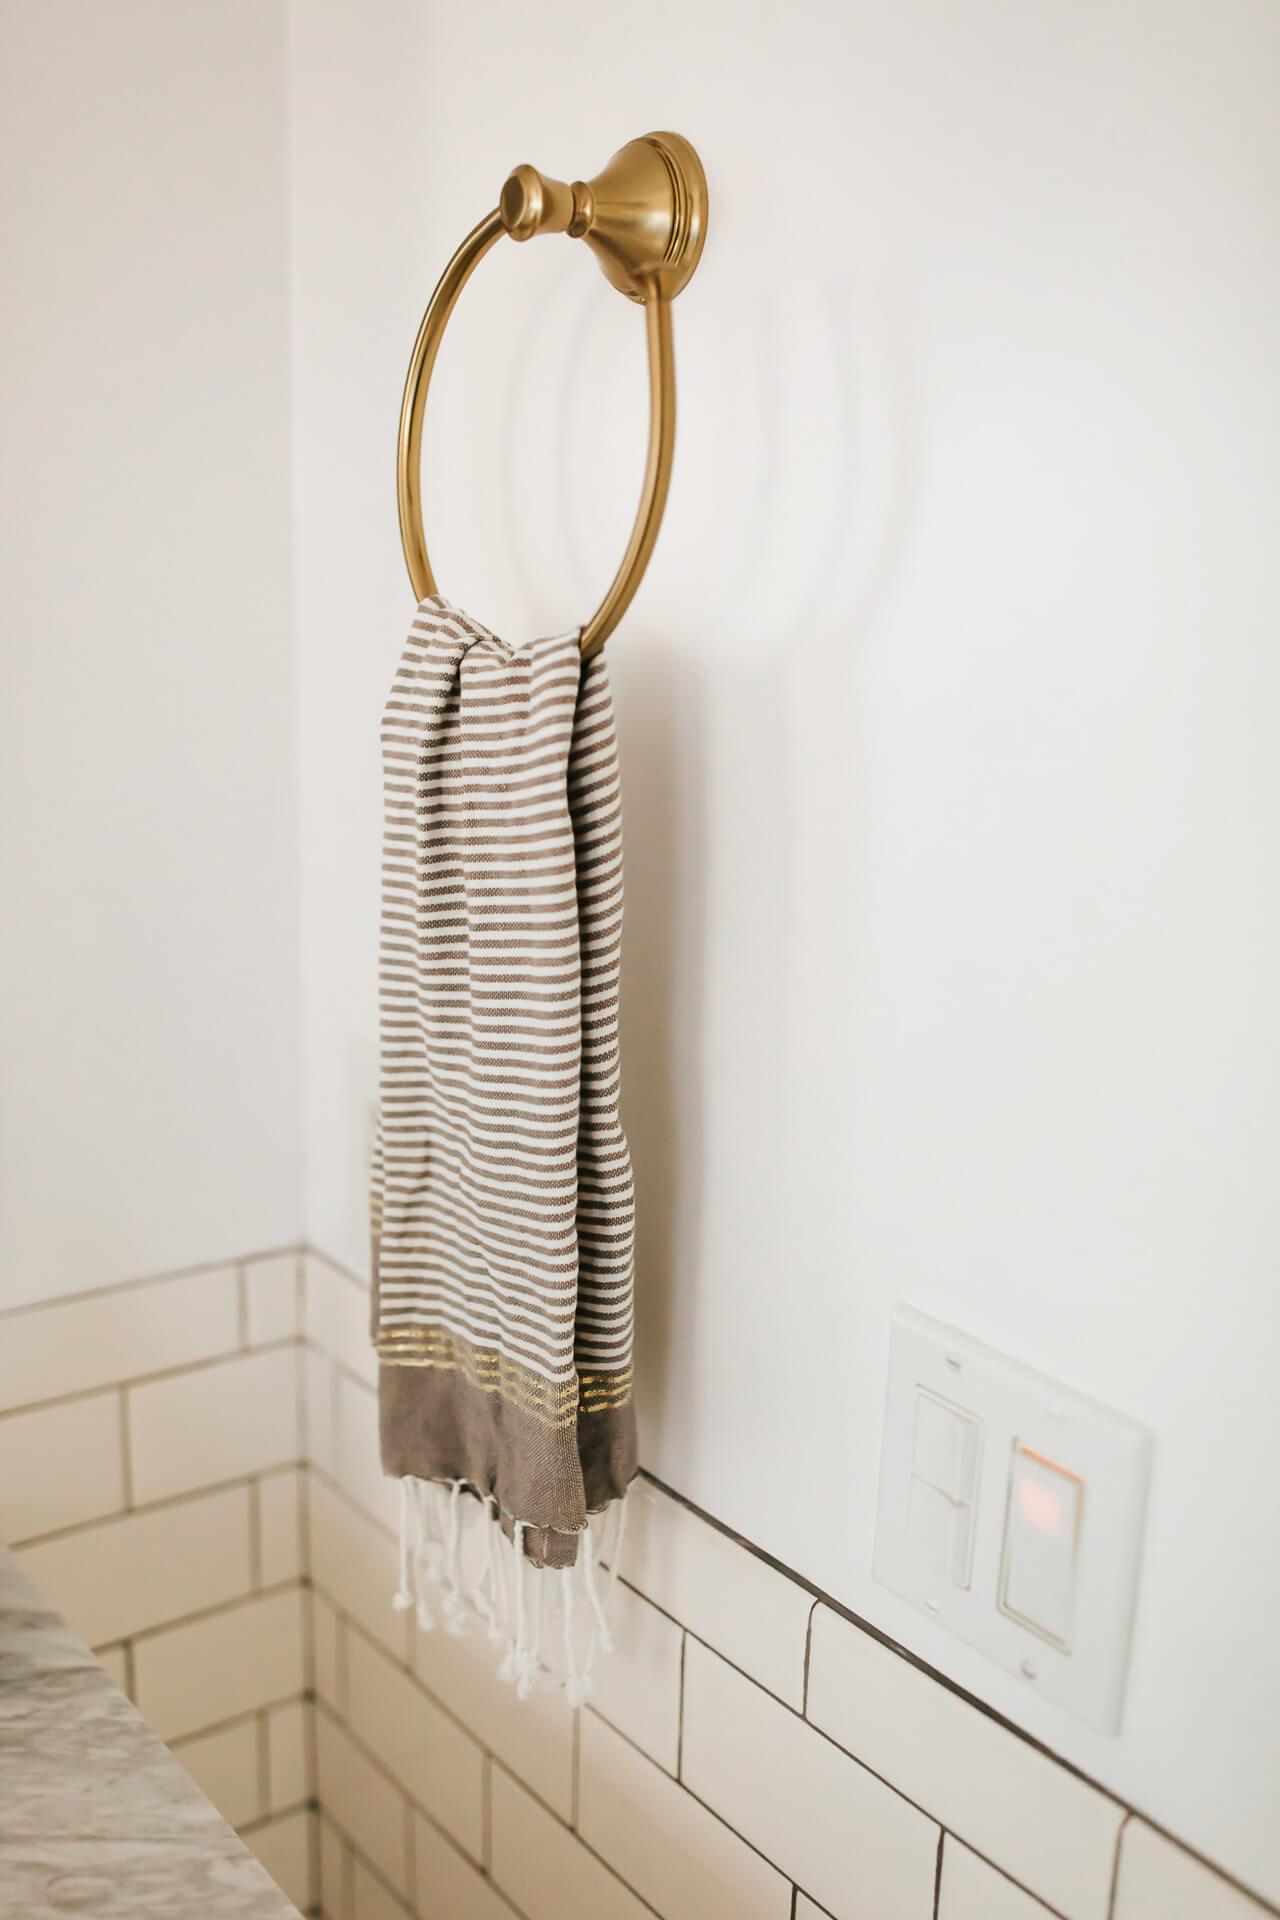 A brass towel holder is a pretty bathroom accessory. - M Loves M @marmar